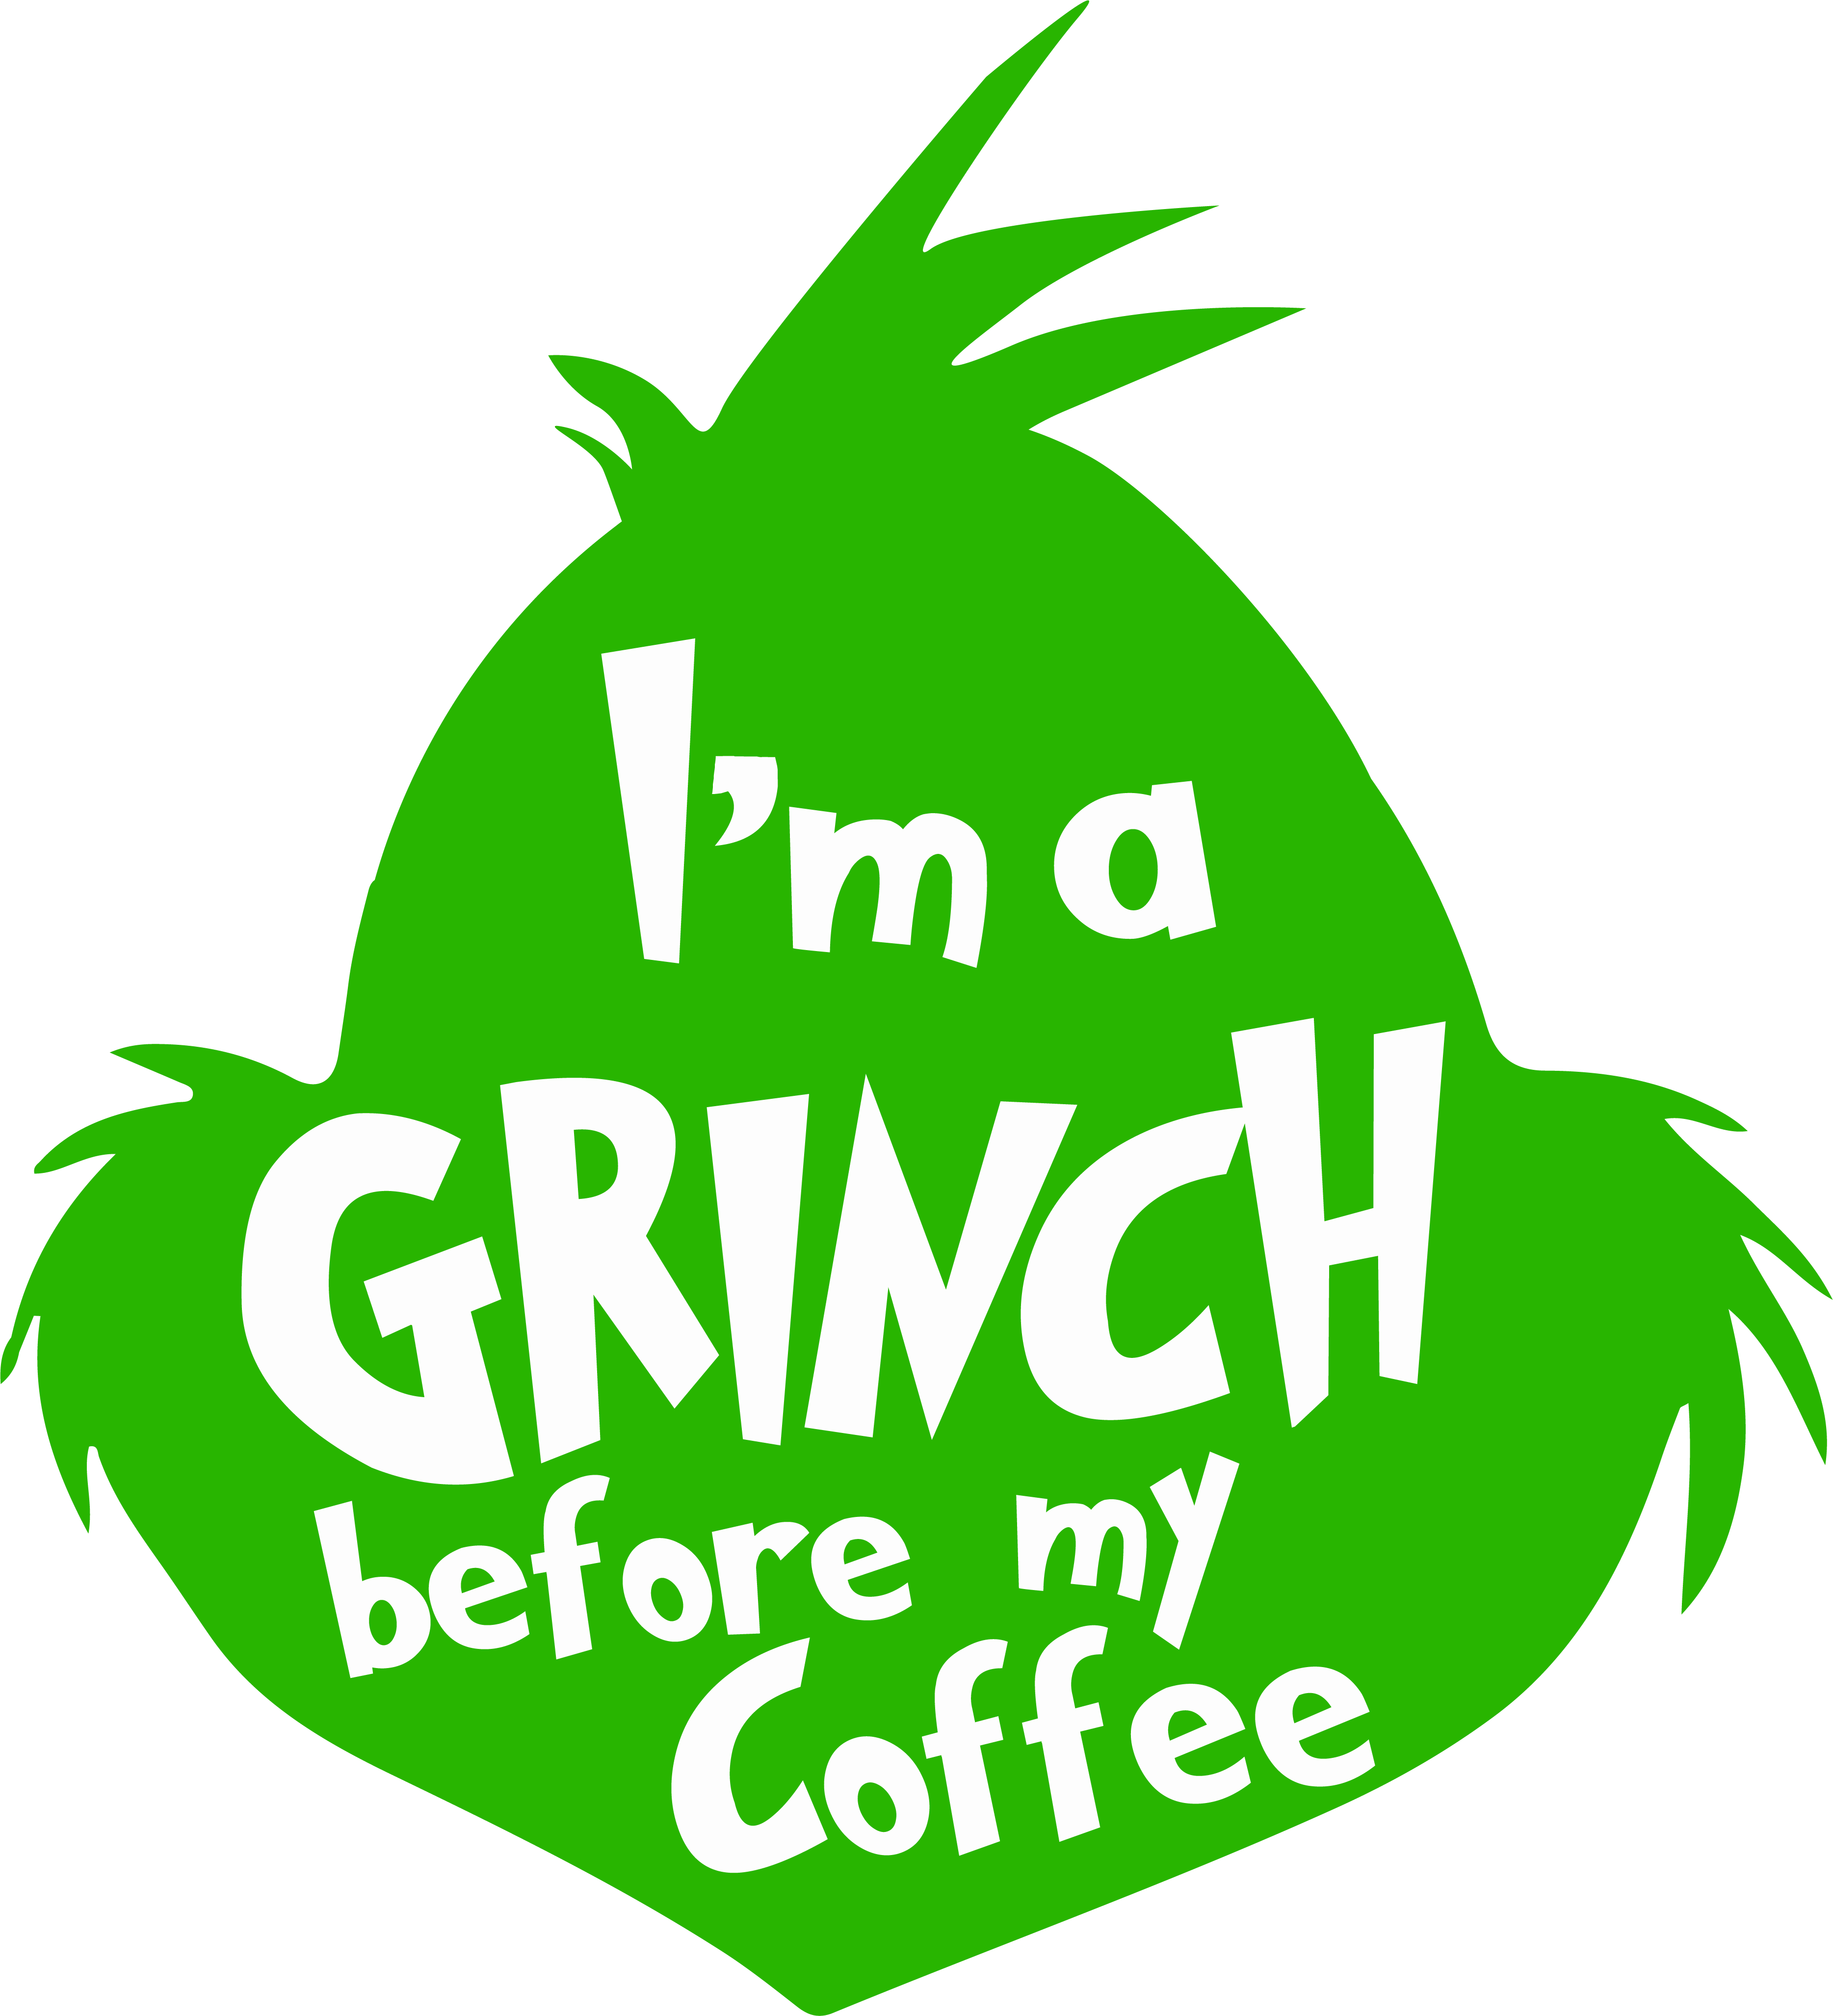 The Grinch Svg Grinch Svg Christmas Grinch Svg Grinch Svg Clipart The Grinch Vector Face Grinch Svg Grinch Cricut Grinch Drawing Grinch Images